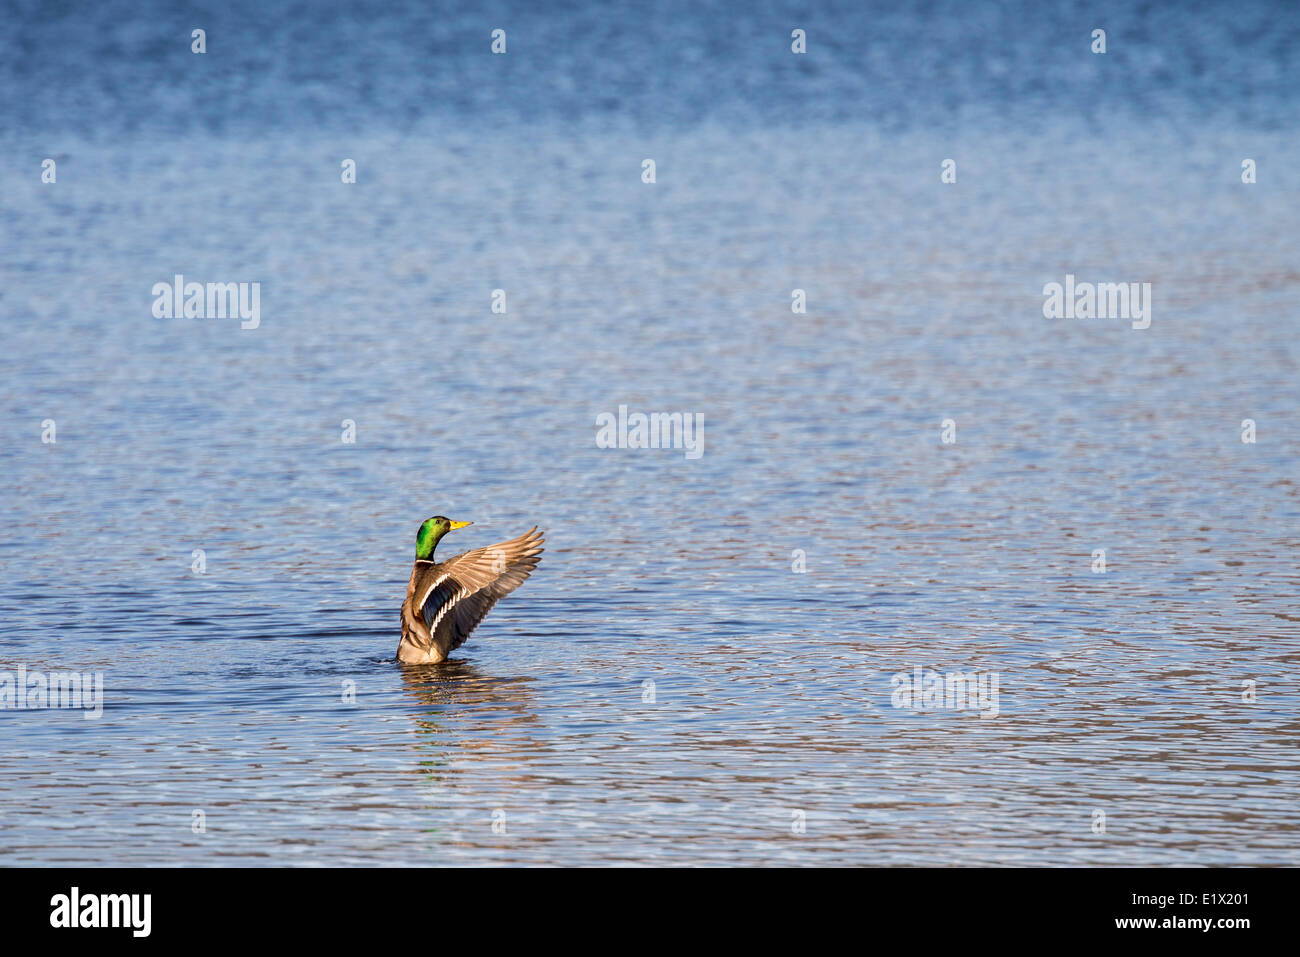 Mallard duck, Anas platyrhynchos, flapping it's wings on Okangan Lake in Penticton, British Columbia, Canada - Stock Image